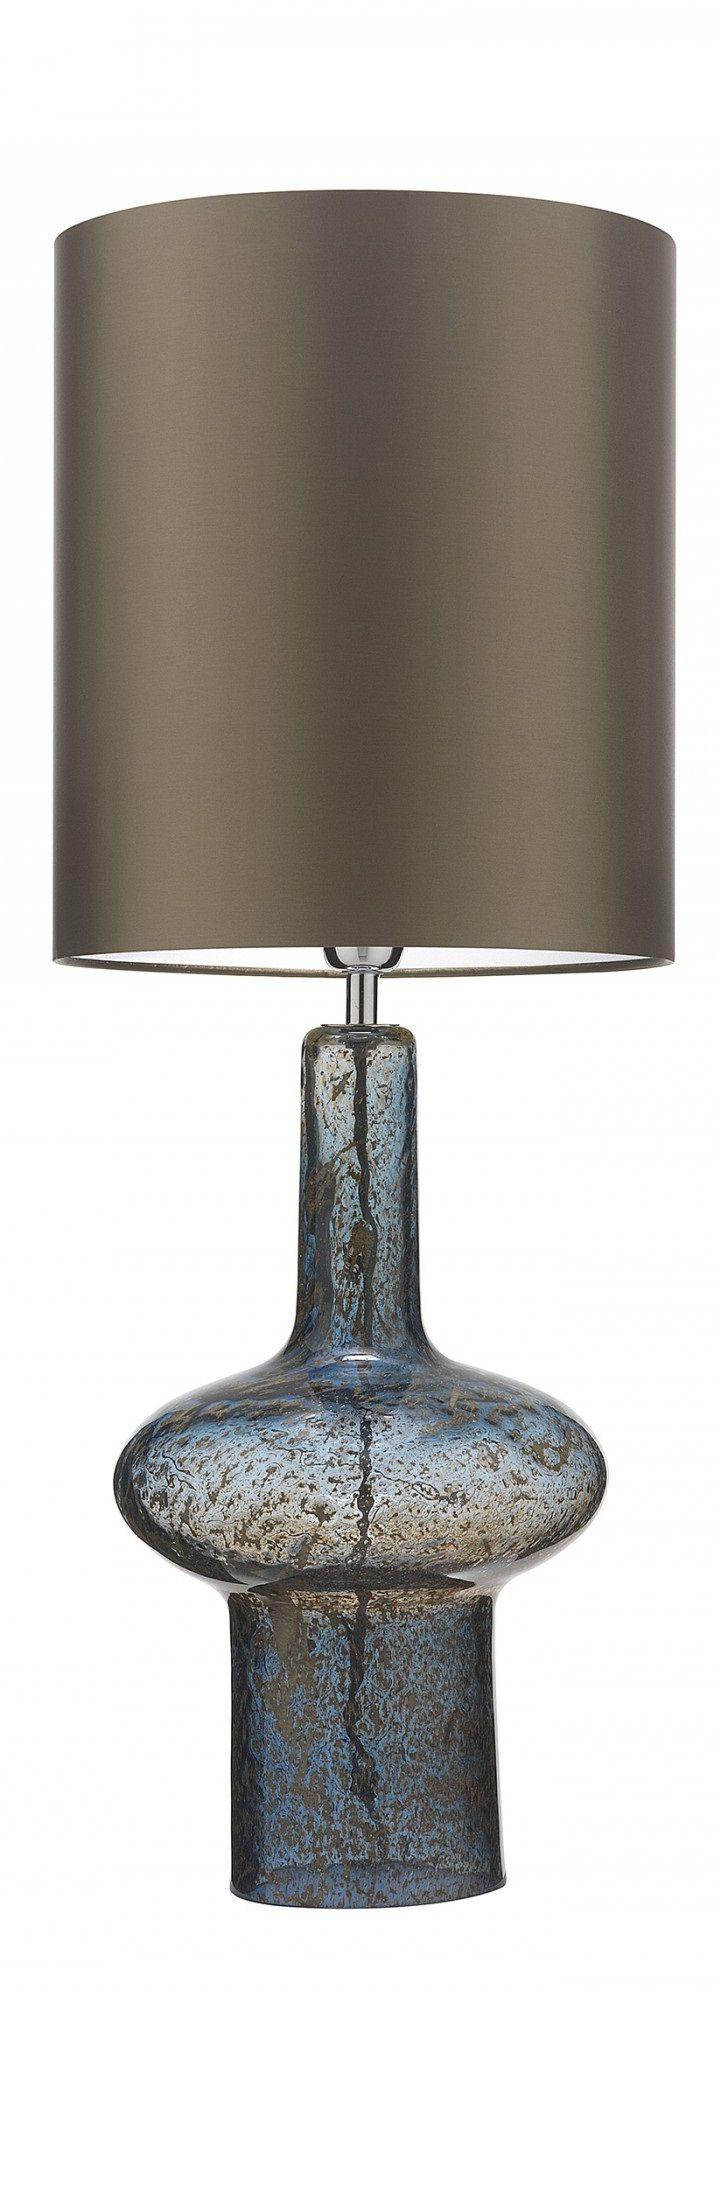 Blue modern table lamp -  Blue Lamp Blue Lamps Lamps Blue Lamp Blue